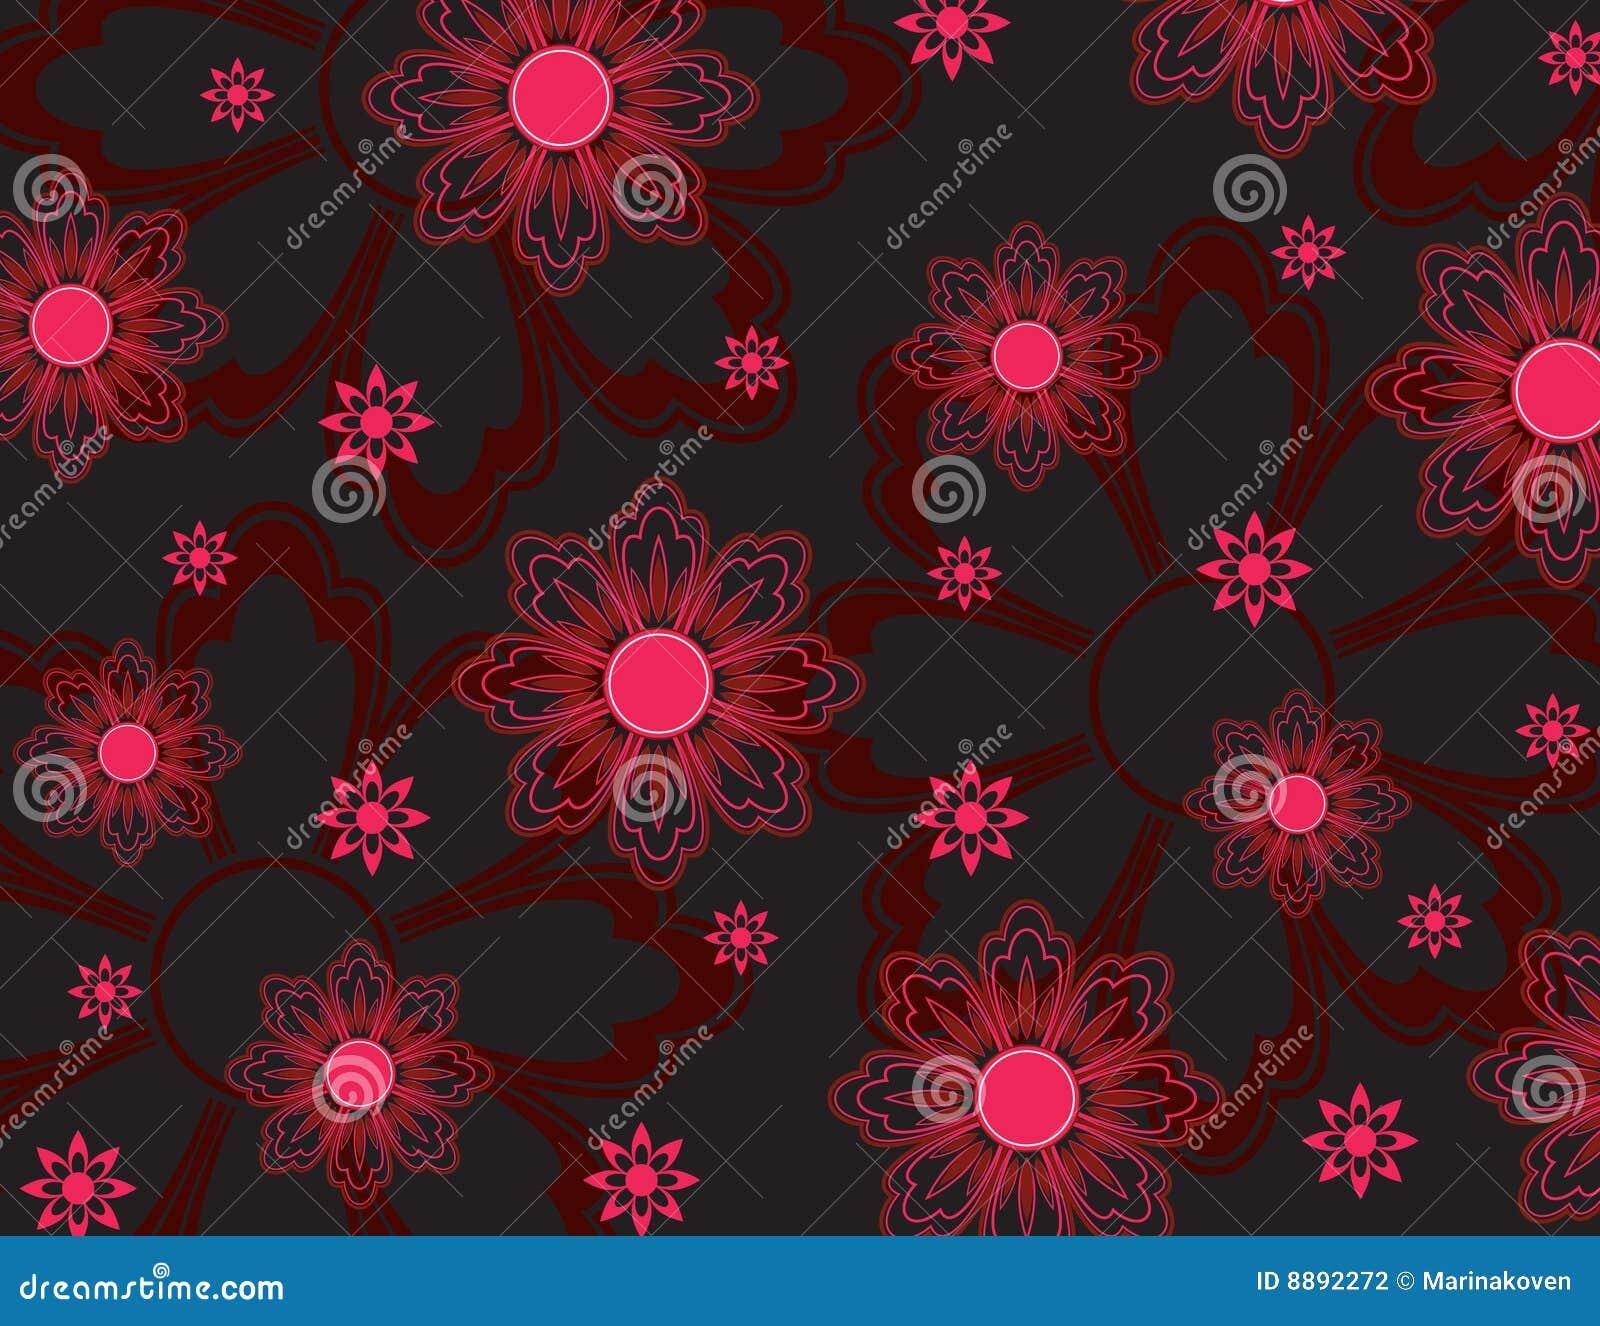 Pink Flowers Wallpaper Stock Illustration Illustration Of Border